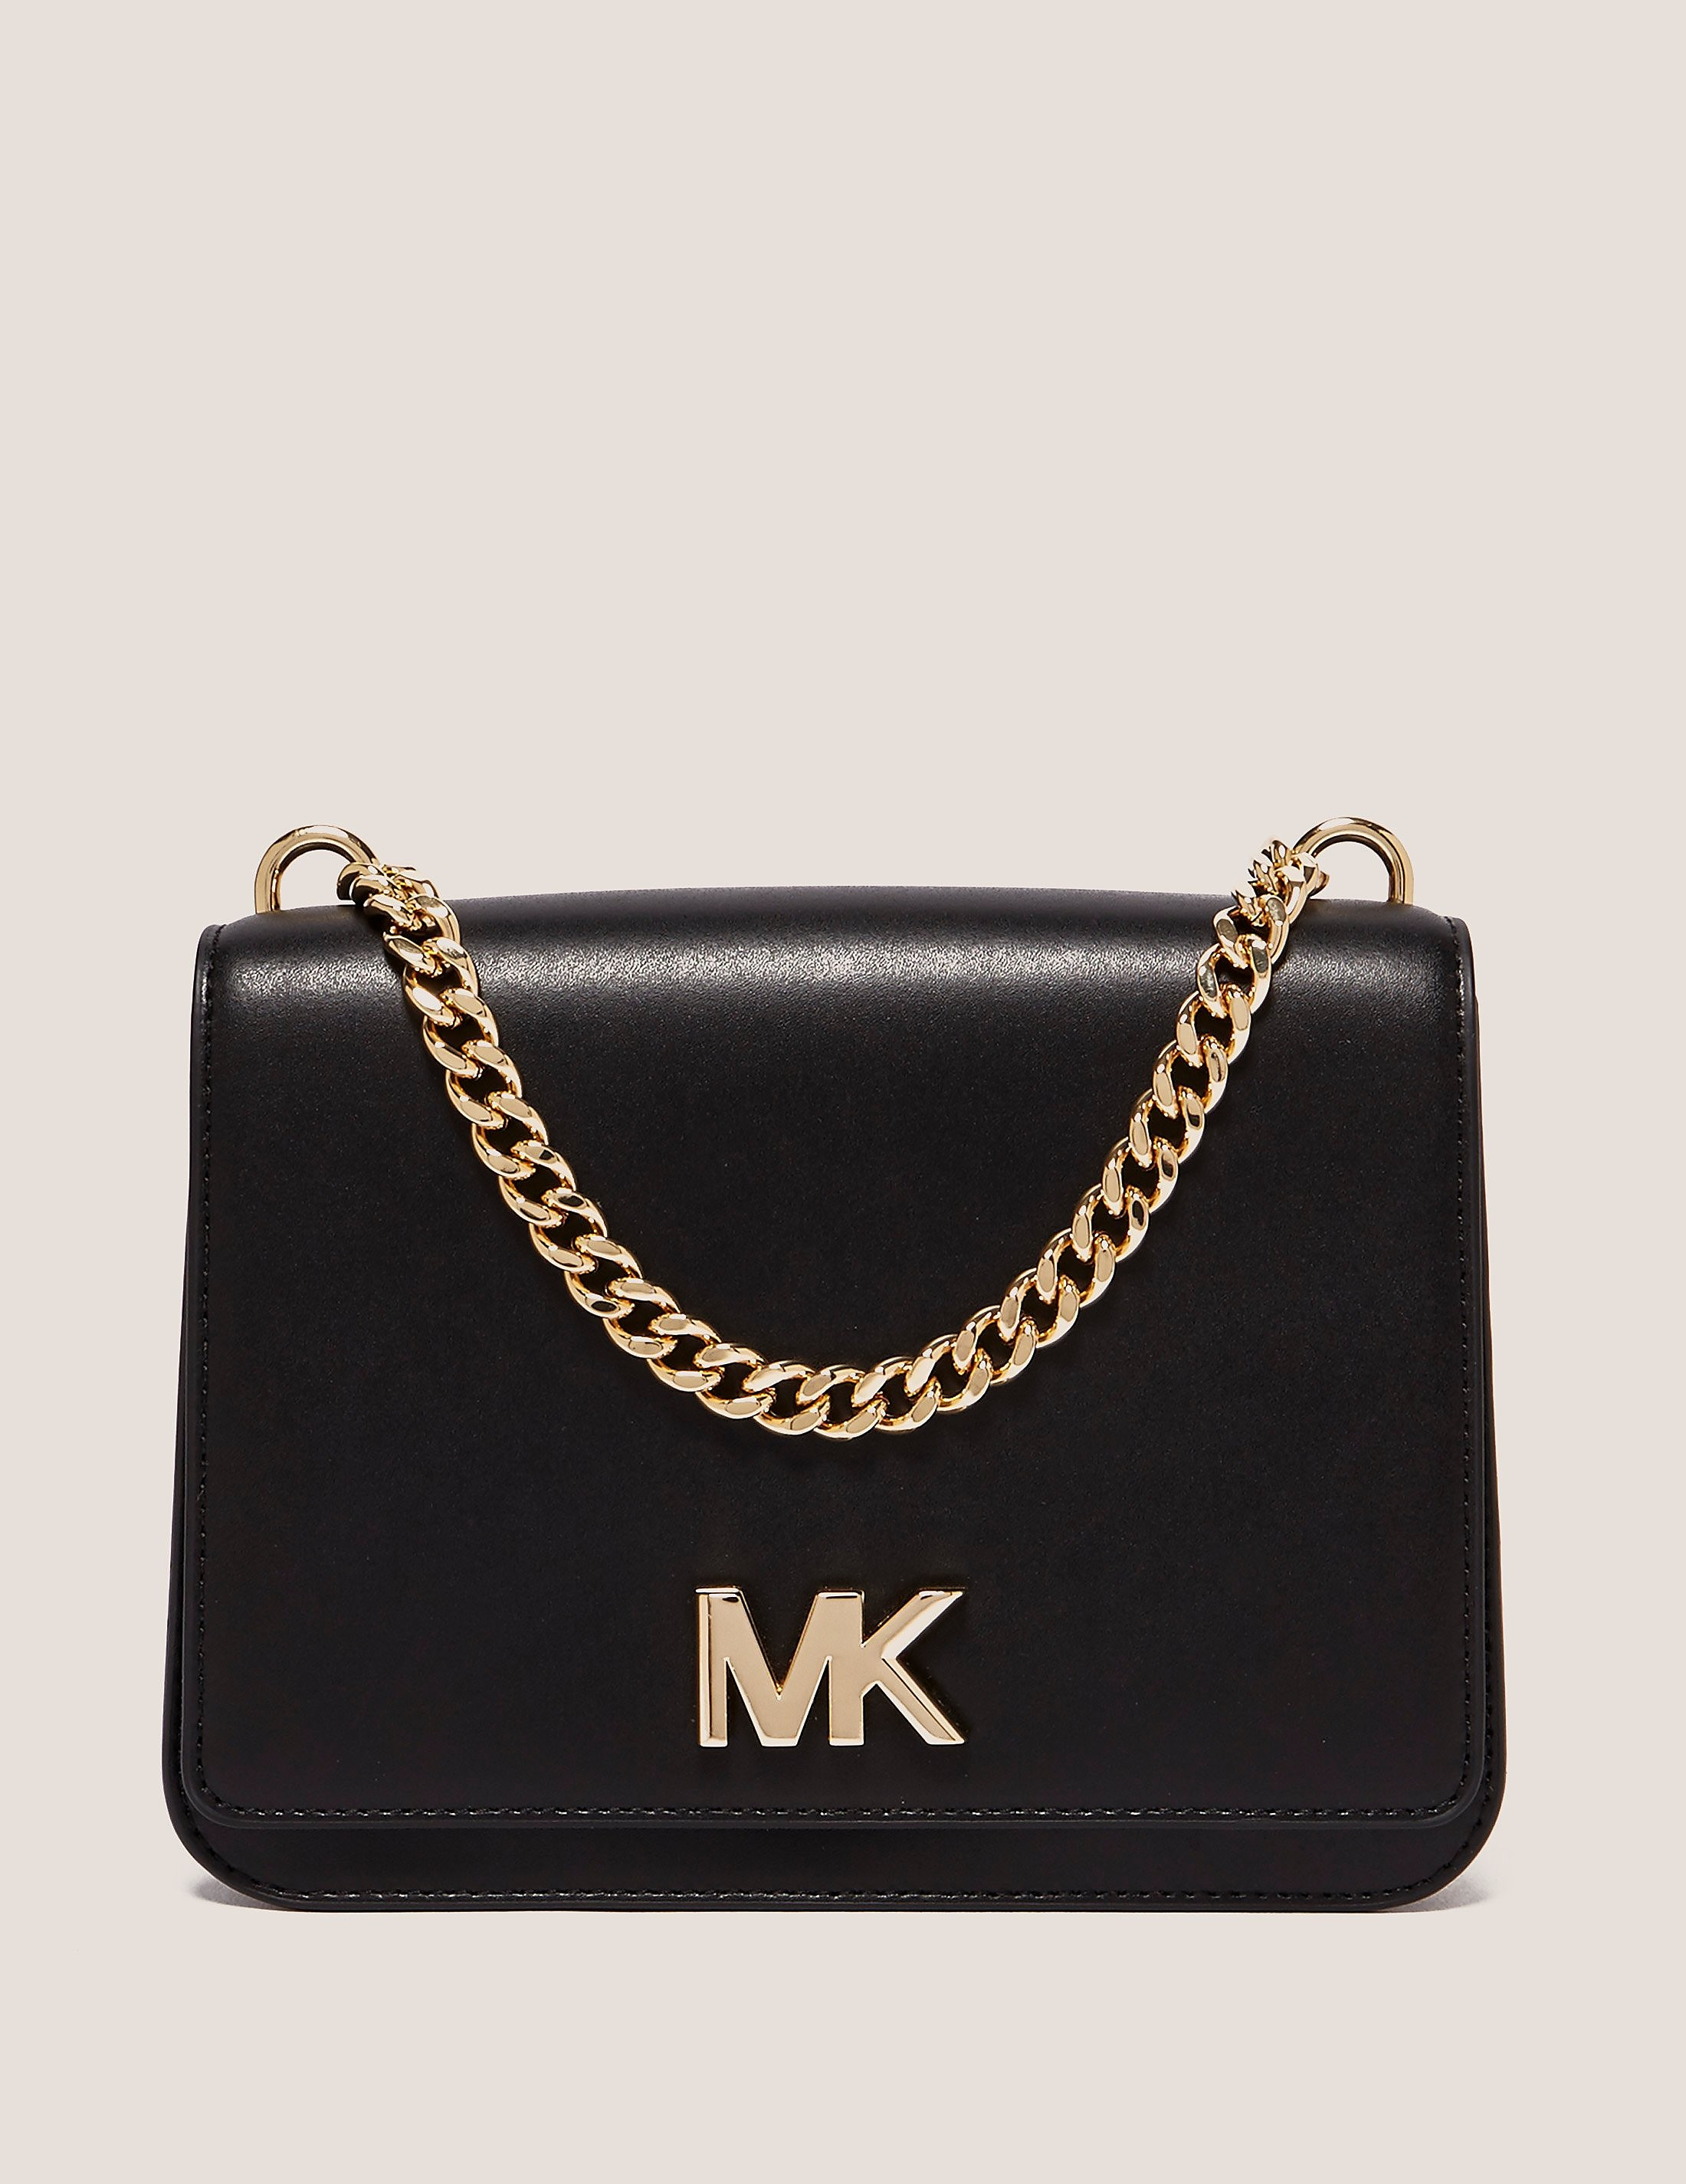 Michael Kors Chain Crossbody Bag